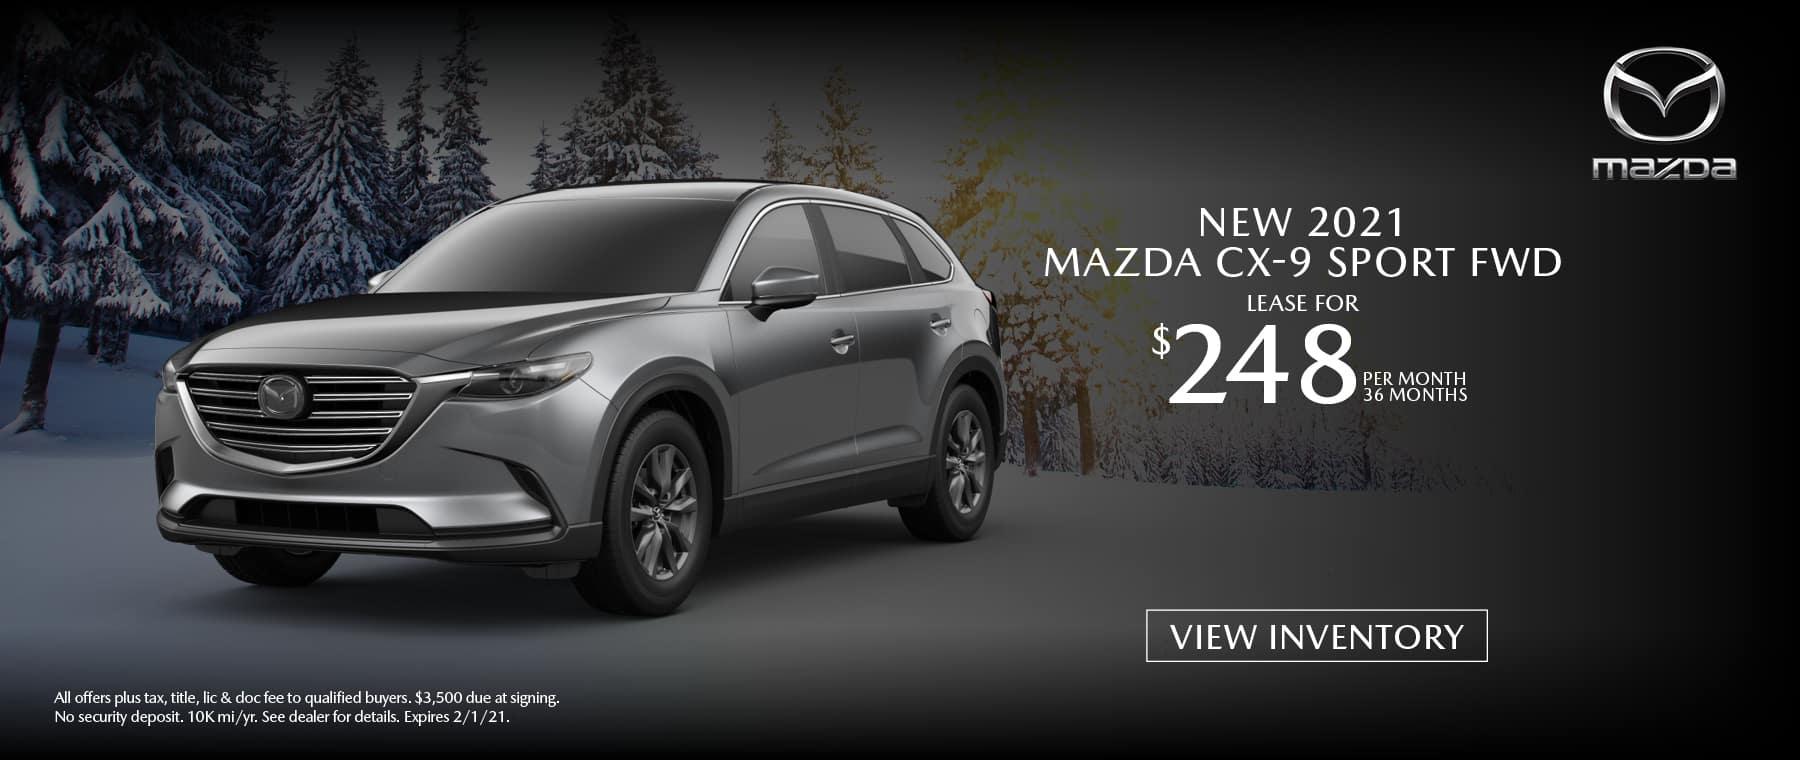 PUGI-MAZ-CX9-SPT-$248-JAN-1800×760